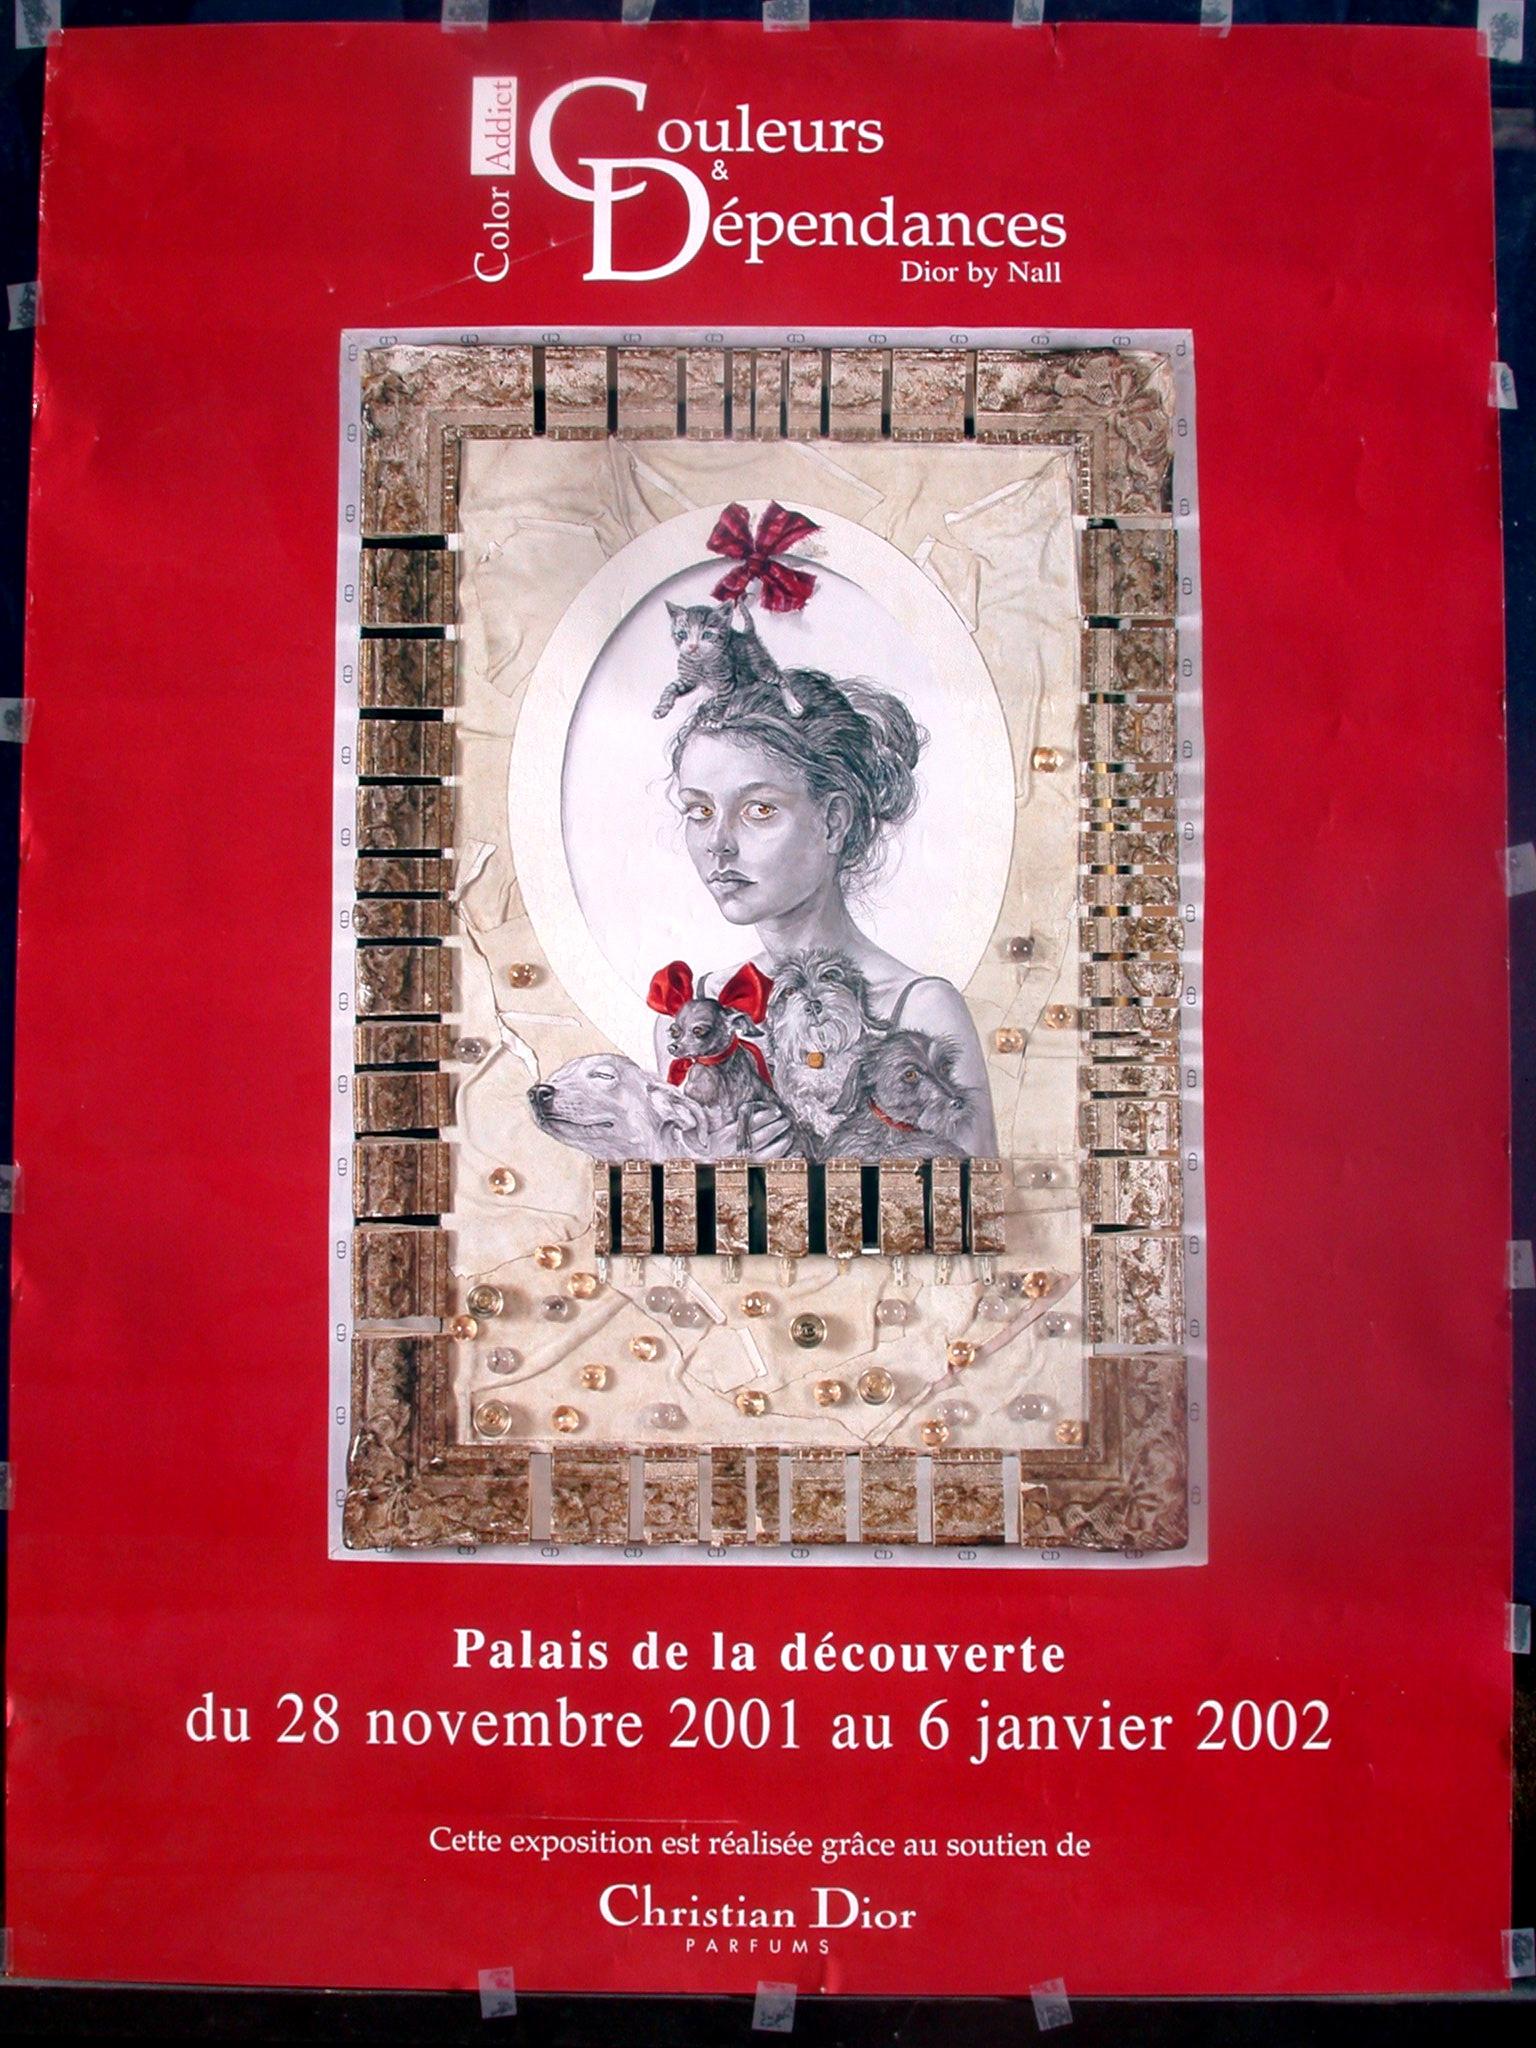 Dior - 2001